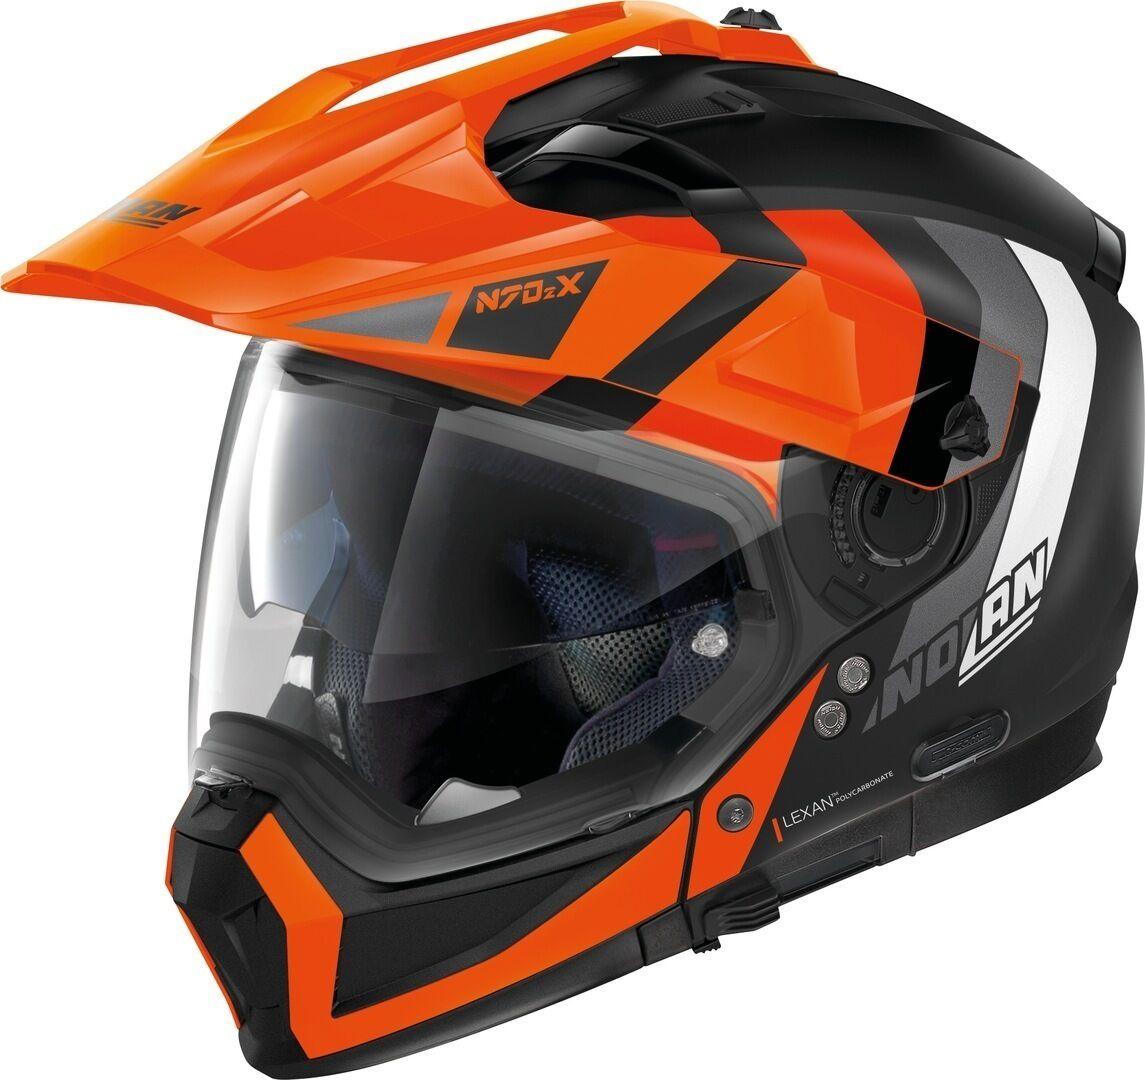 Nolan N70-2 X Decurio N-Com Helmet  - Black Orange - Size: L